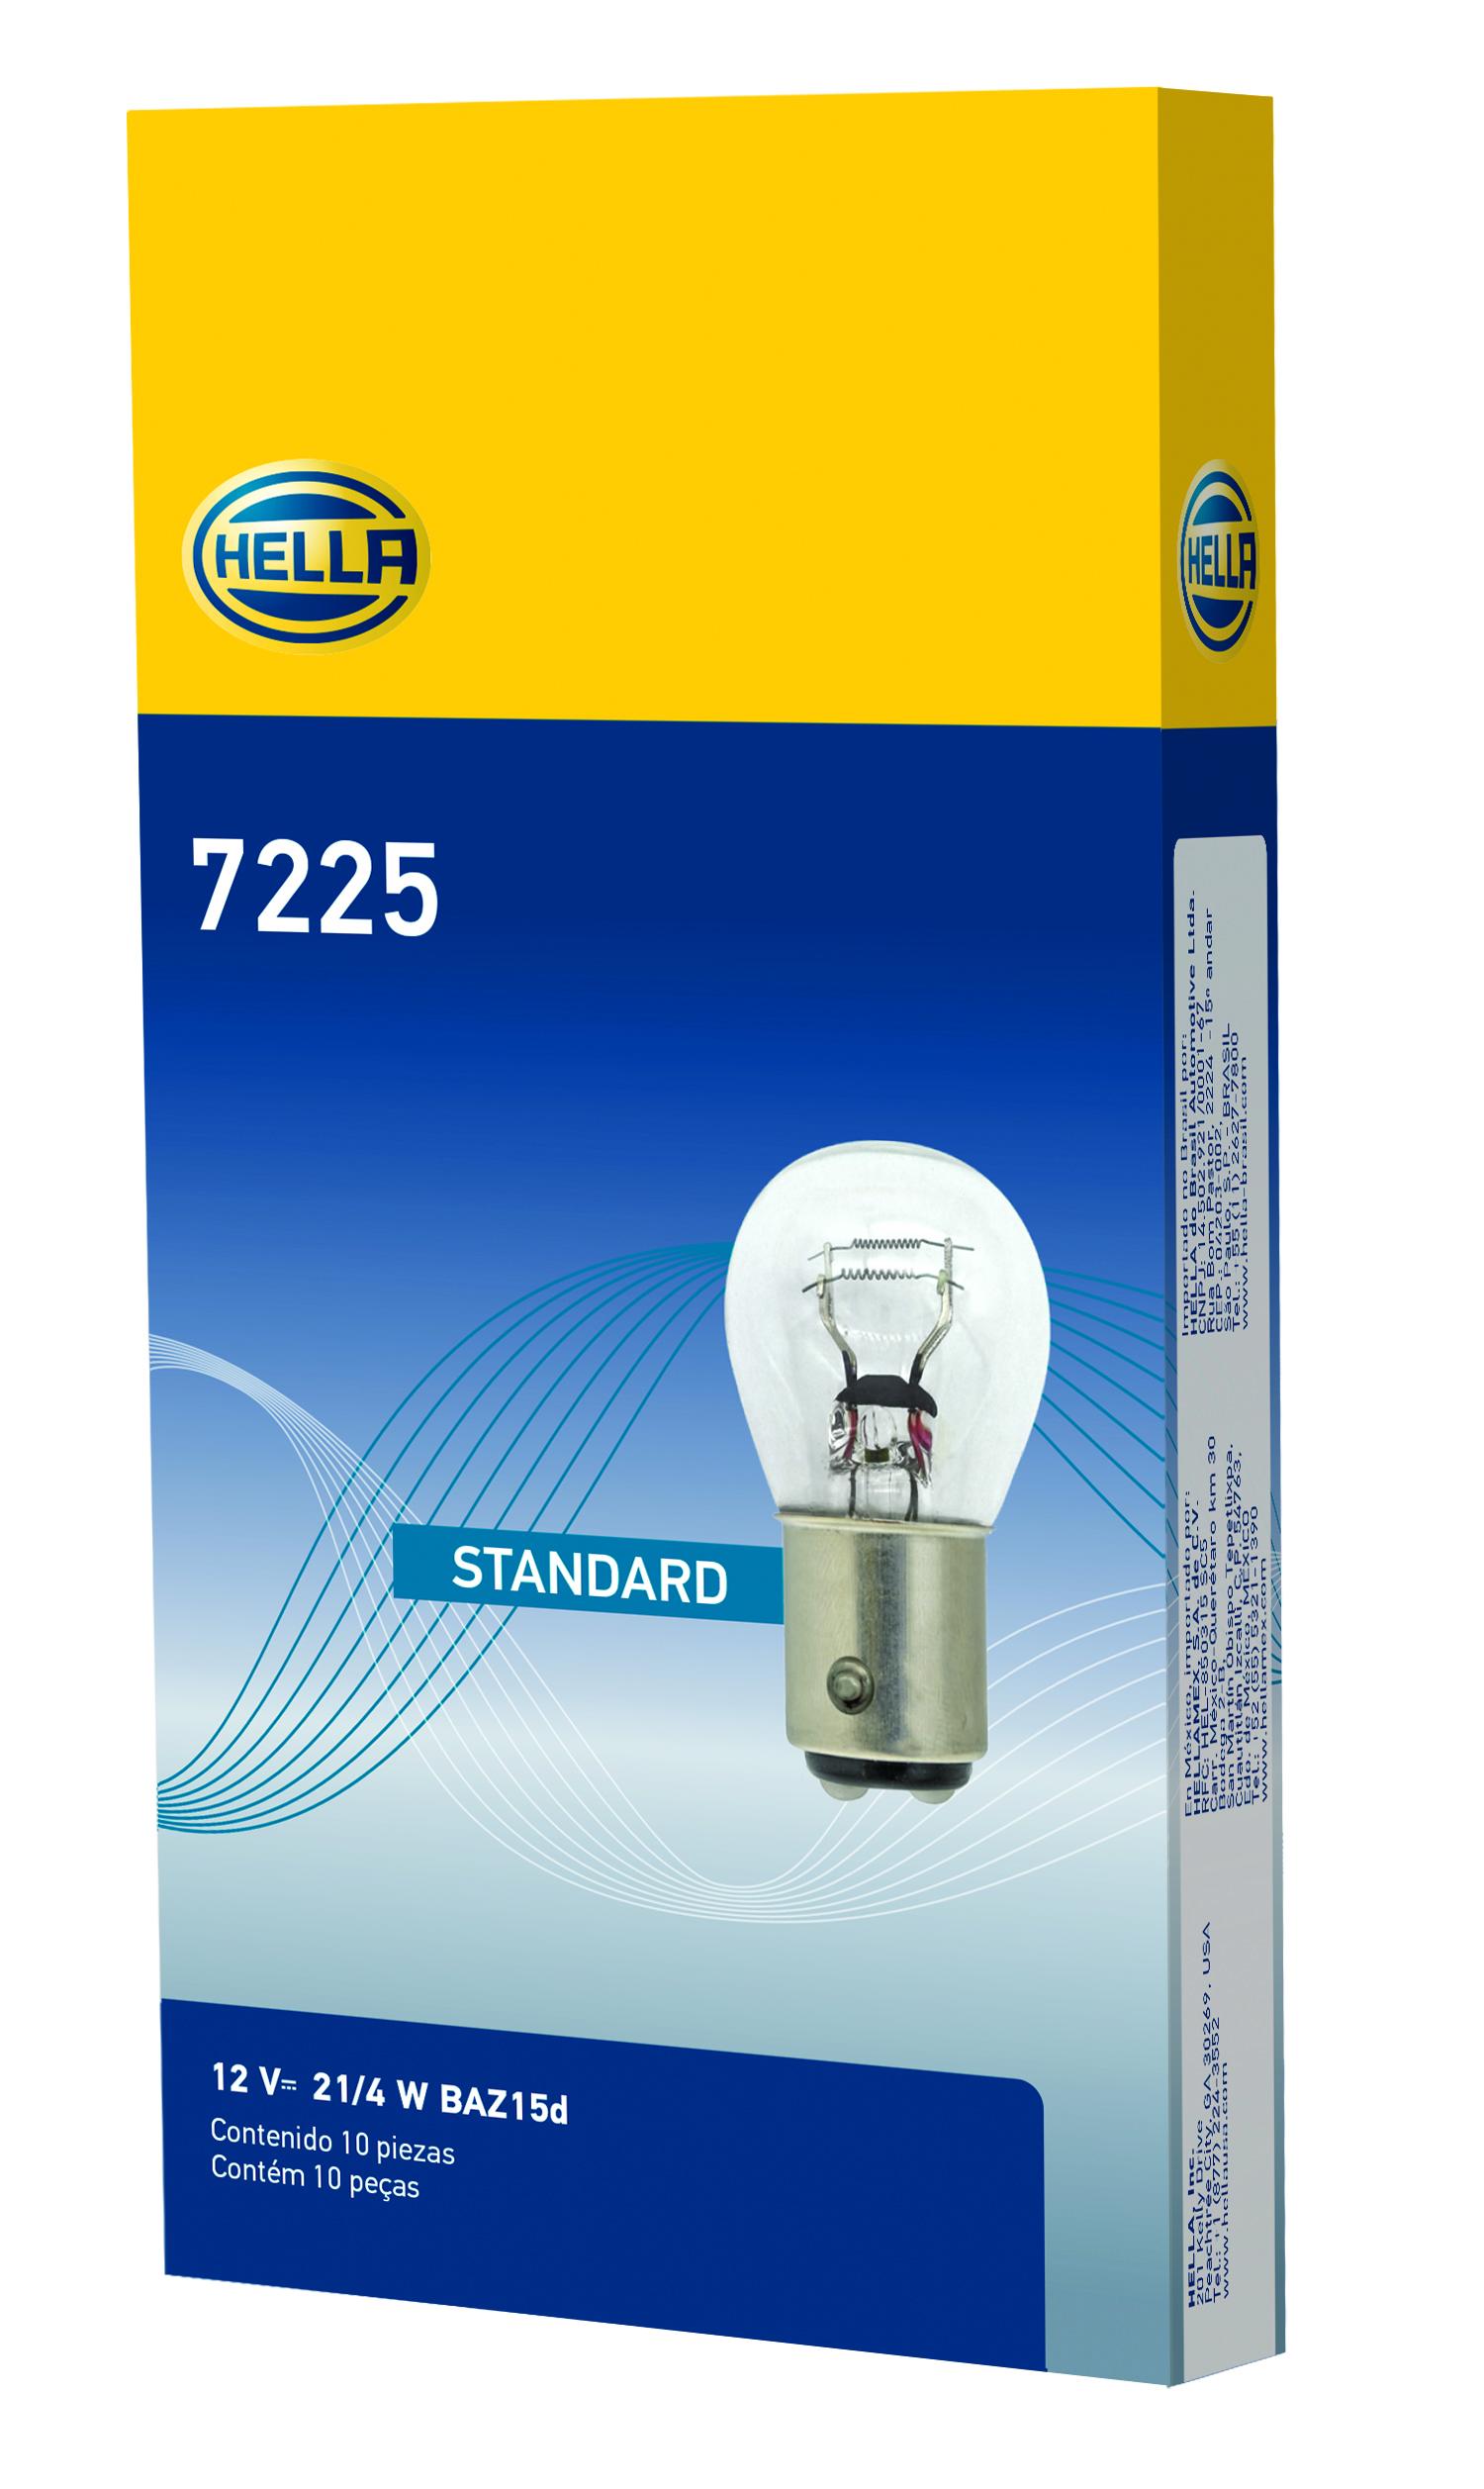 Hella Brake Light Bulb 0008250194 7225